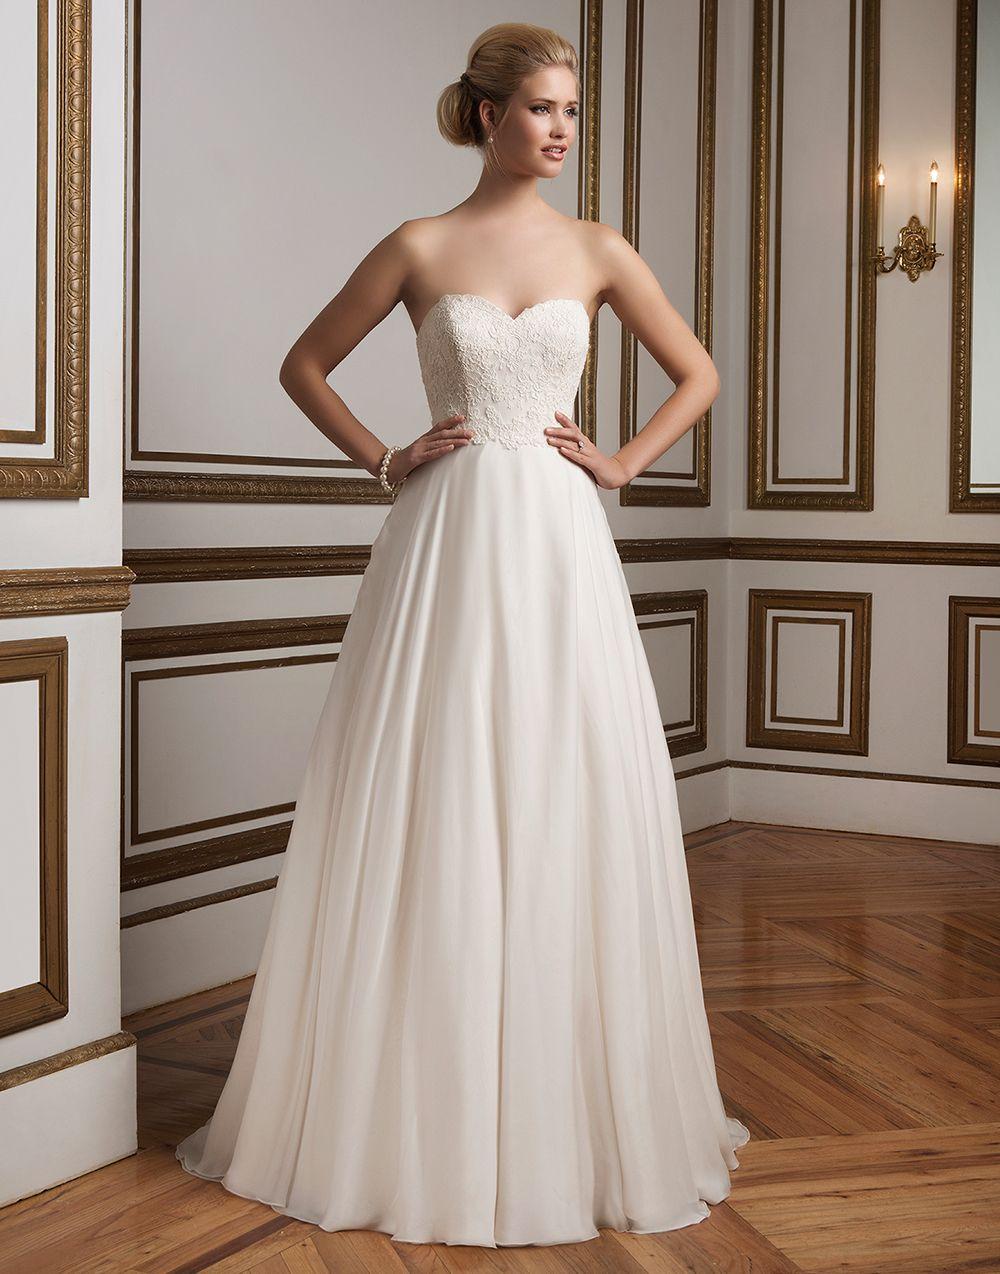 Justin alexander wedding dresses style lace bodice bodice